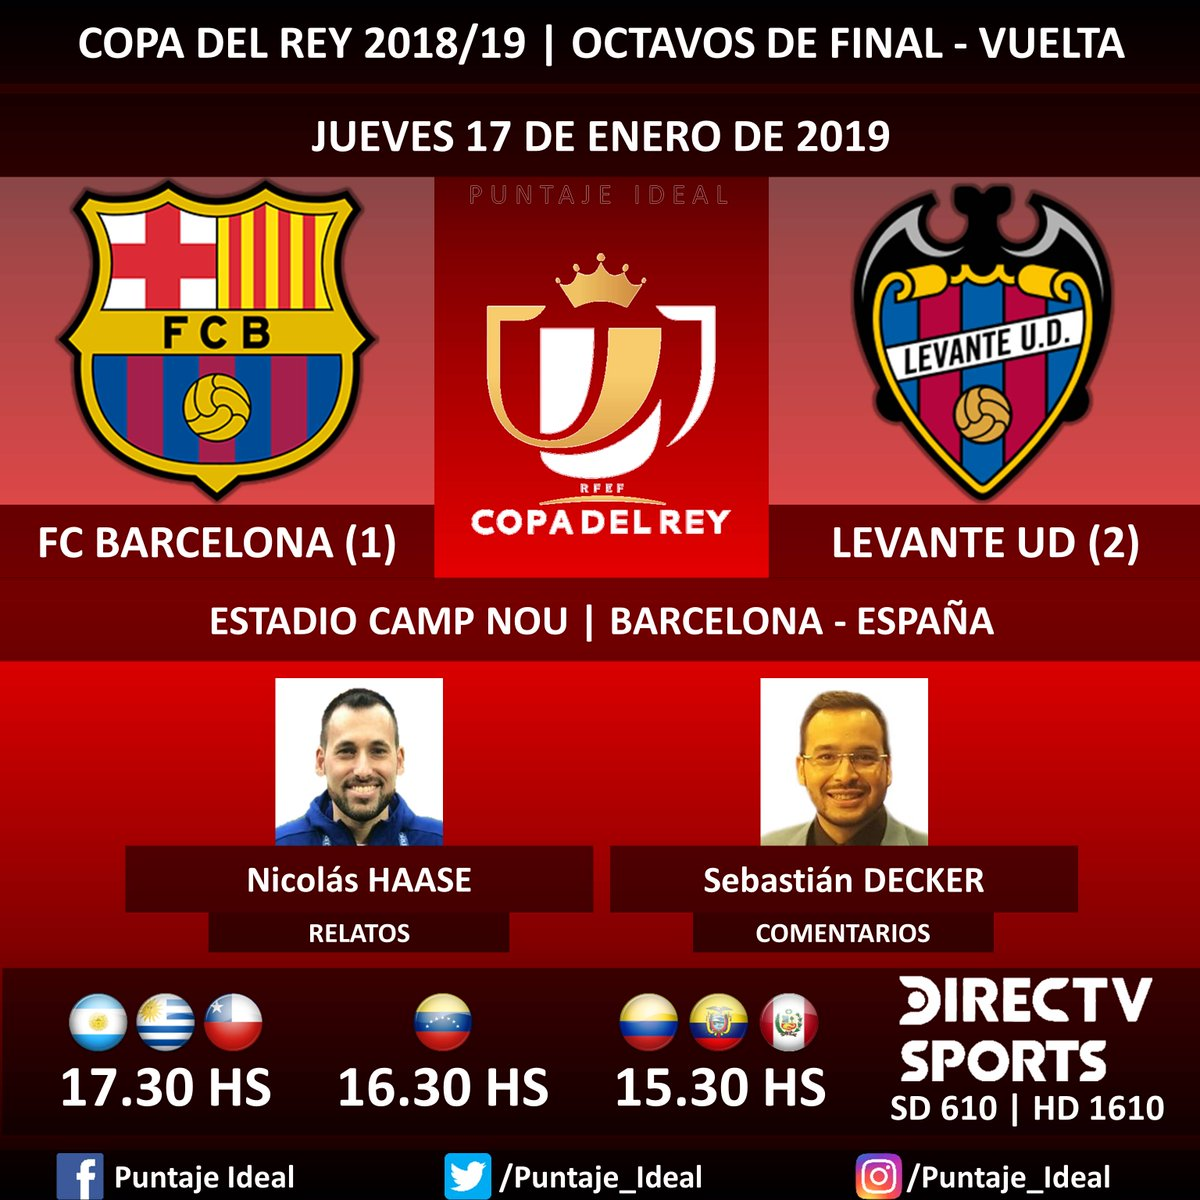 ⚽ #FútbolEnDIRECTV   #FCBarcelona vs. #LevanteUD 🎙 Relatos: @haasenico  🎙 Comentarios: @SebasDecker  📺 TV: @DIRECTVSports Sudamérica (610 - 1610 HD) - #Torneos 🤳 #SoySportista - #CopaDelRey 🇪🇸 - #BarçaLevante  Dale RT 🔃